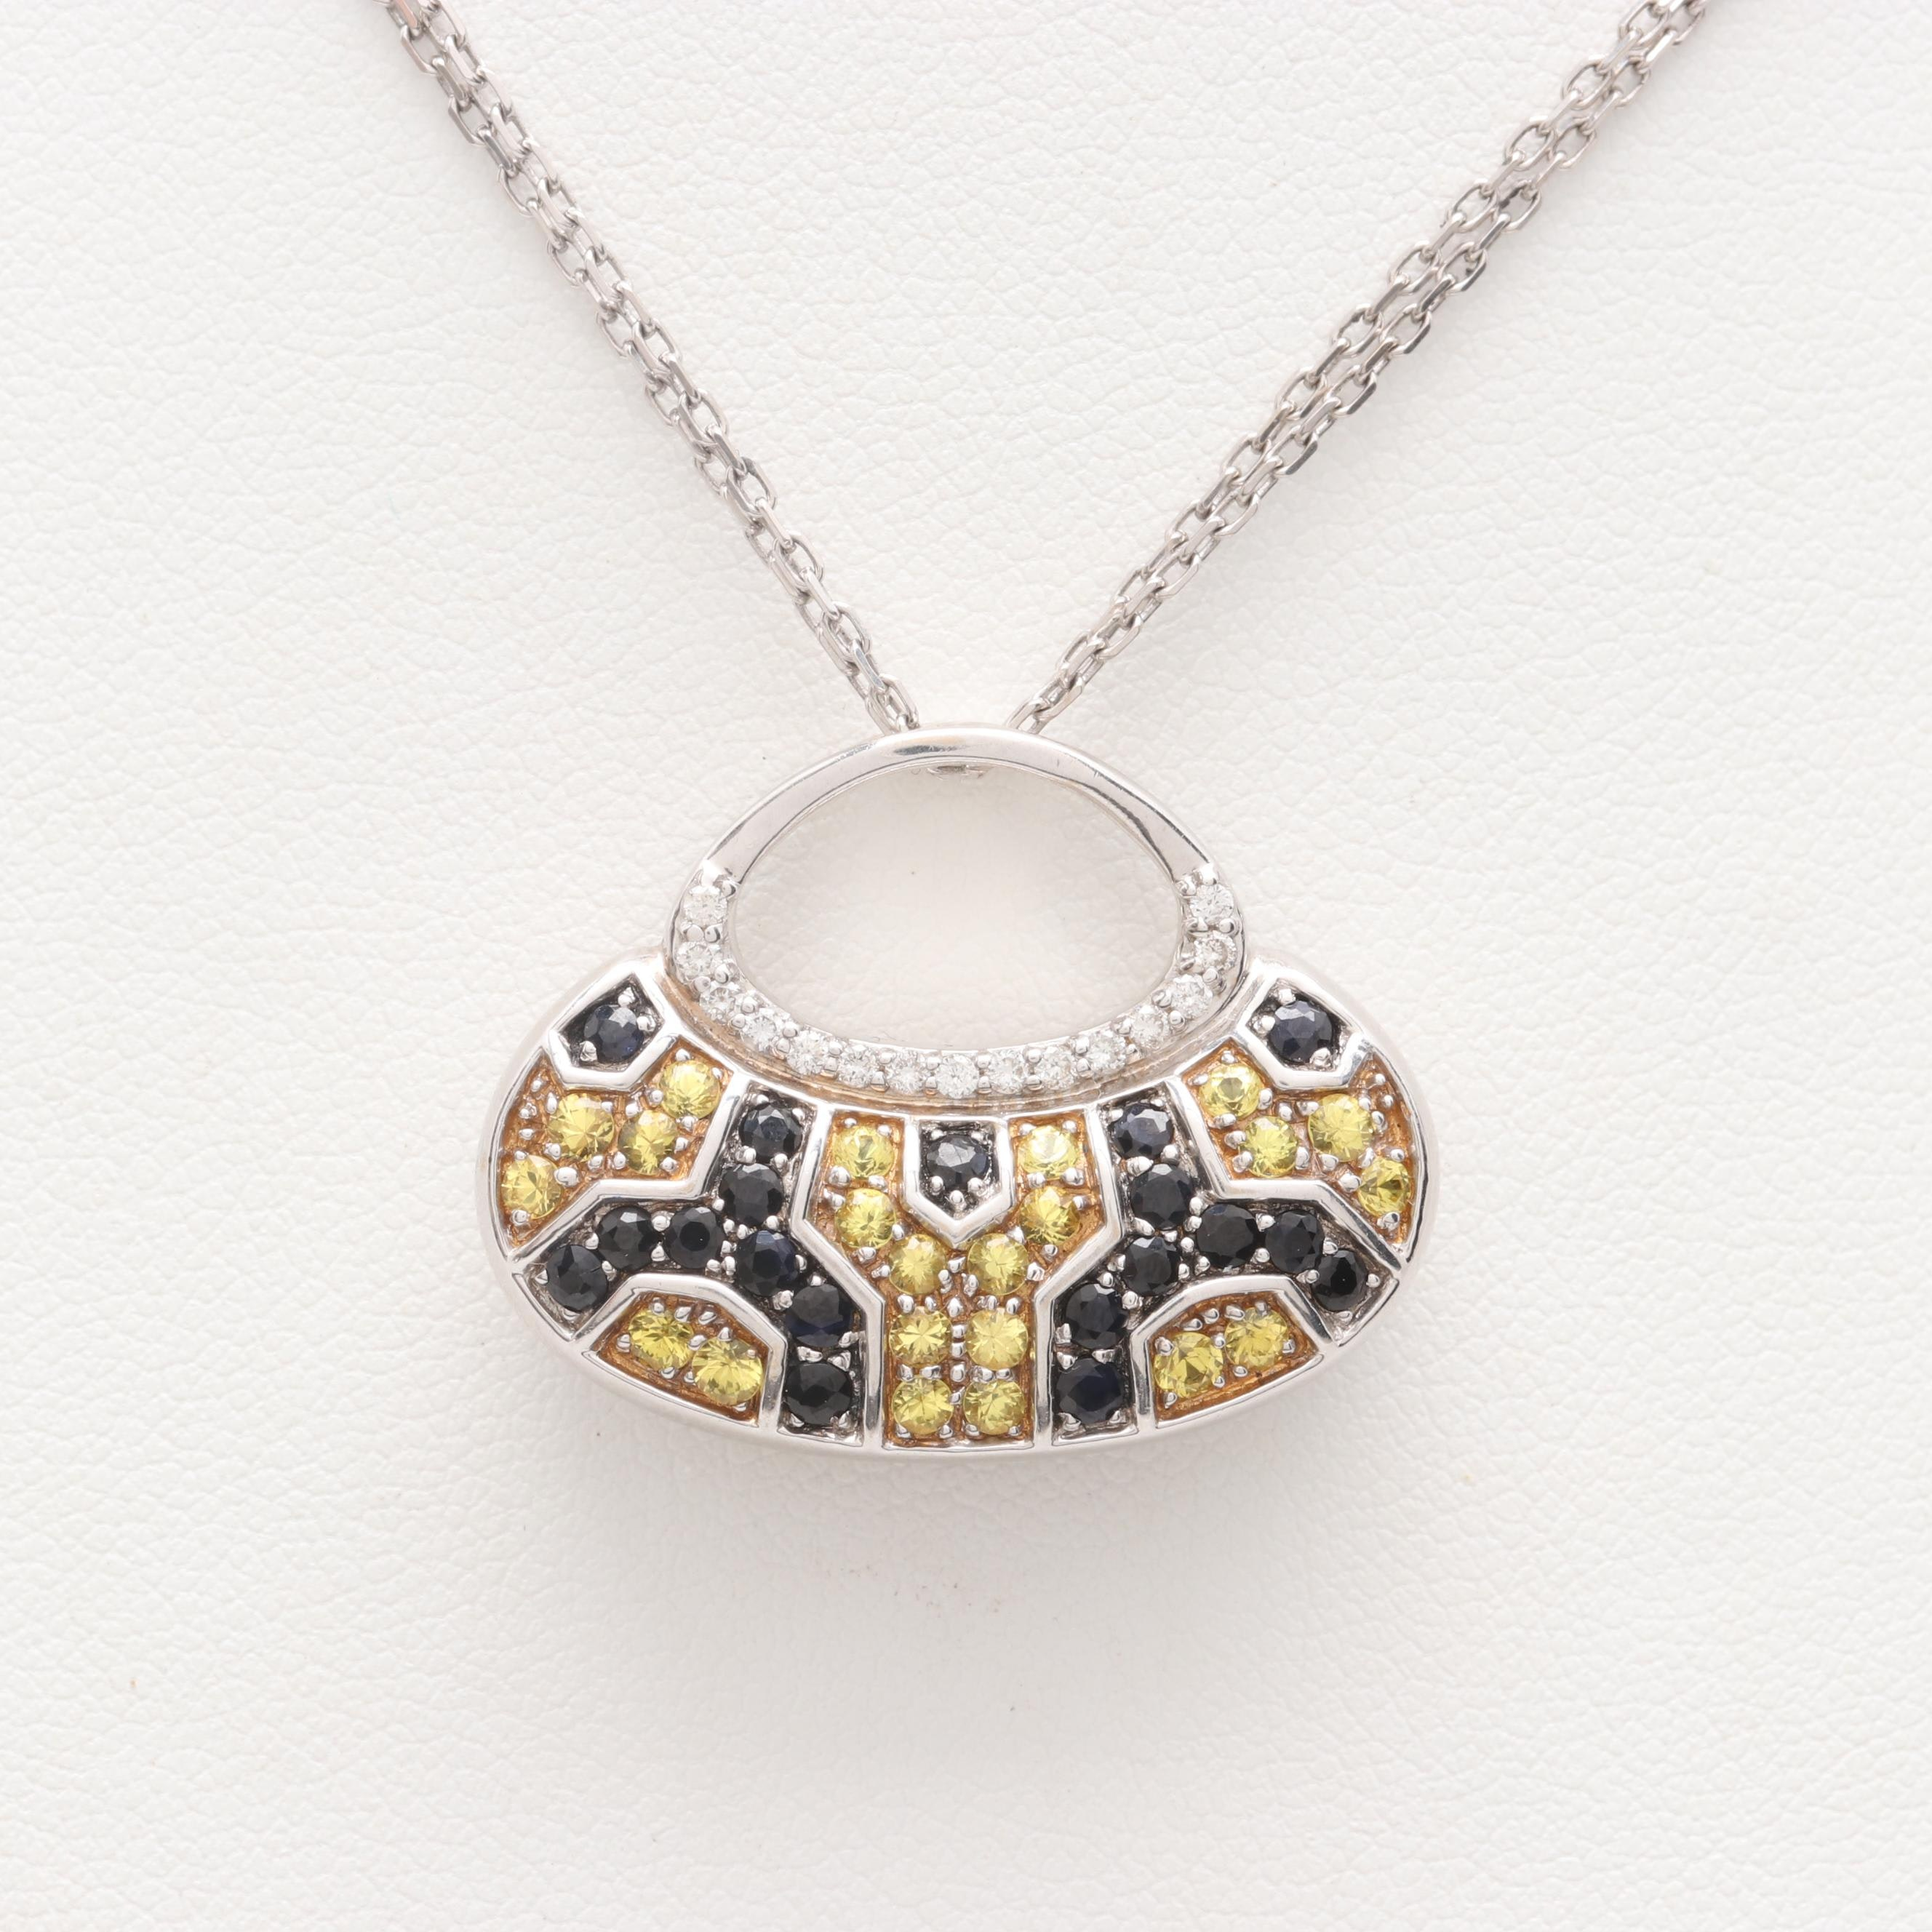 18K White Gold Sapphire and Diamond Handbag Motif Pendant Necklace